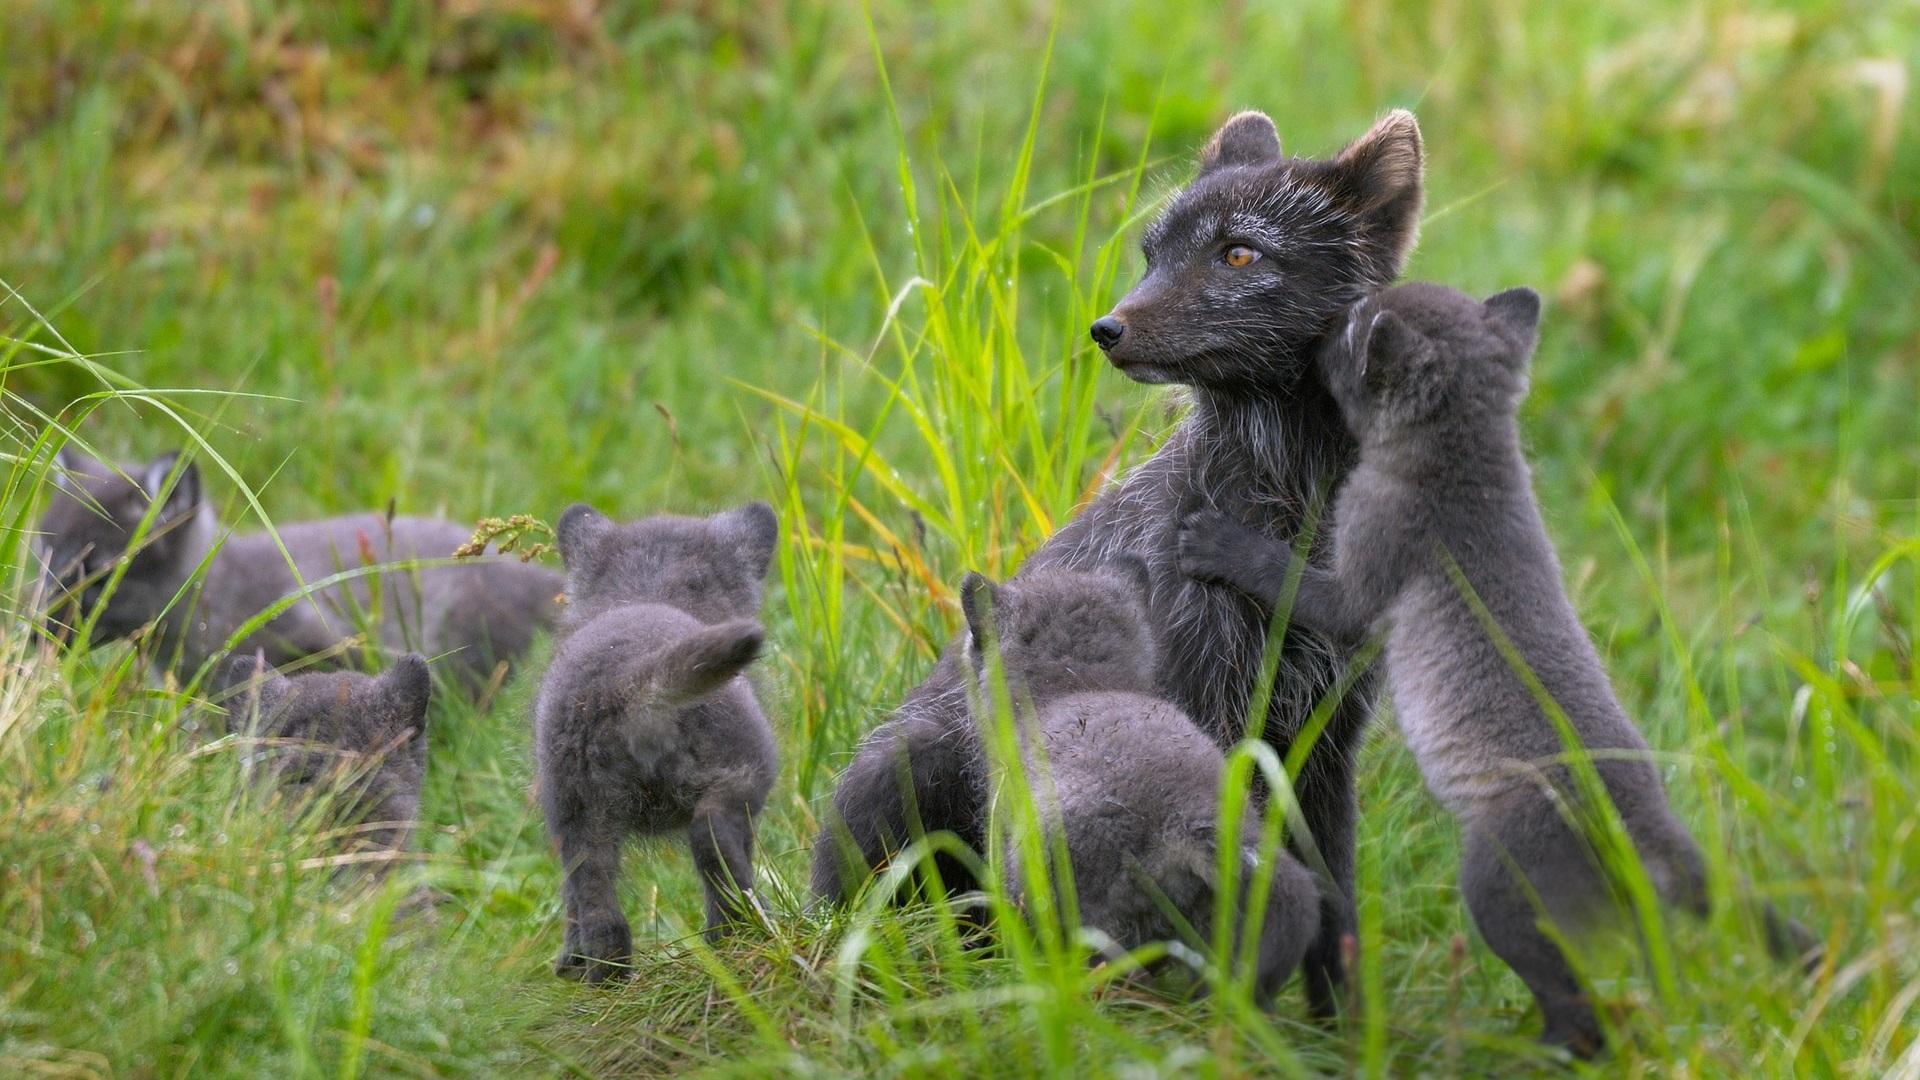 Wallpaper Finland Black Arctic Fox Family Summer Grass 1920x1200 Hd Picture Image